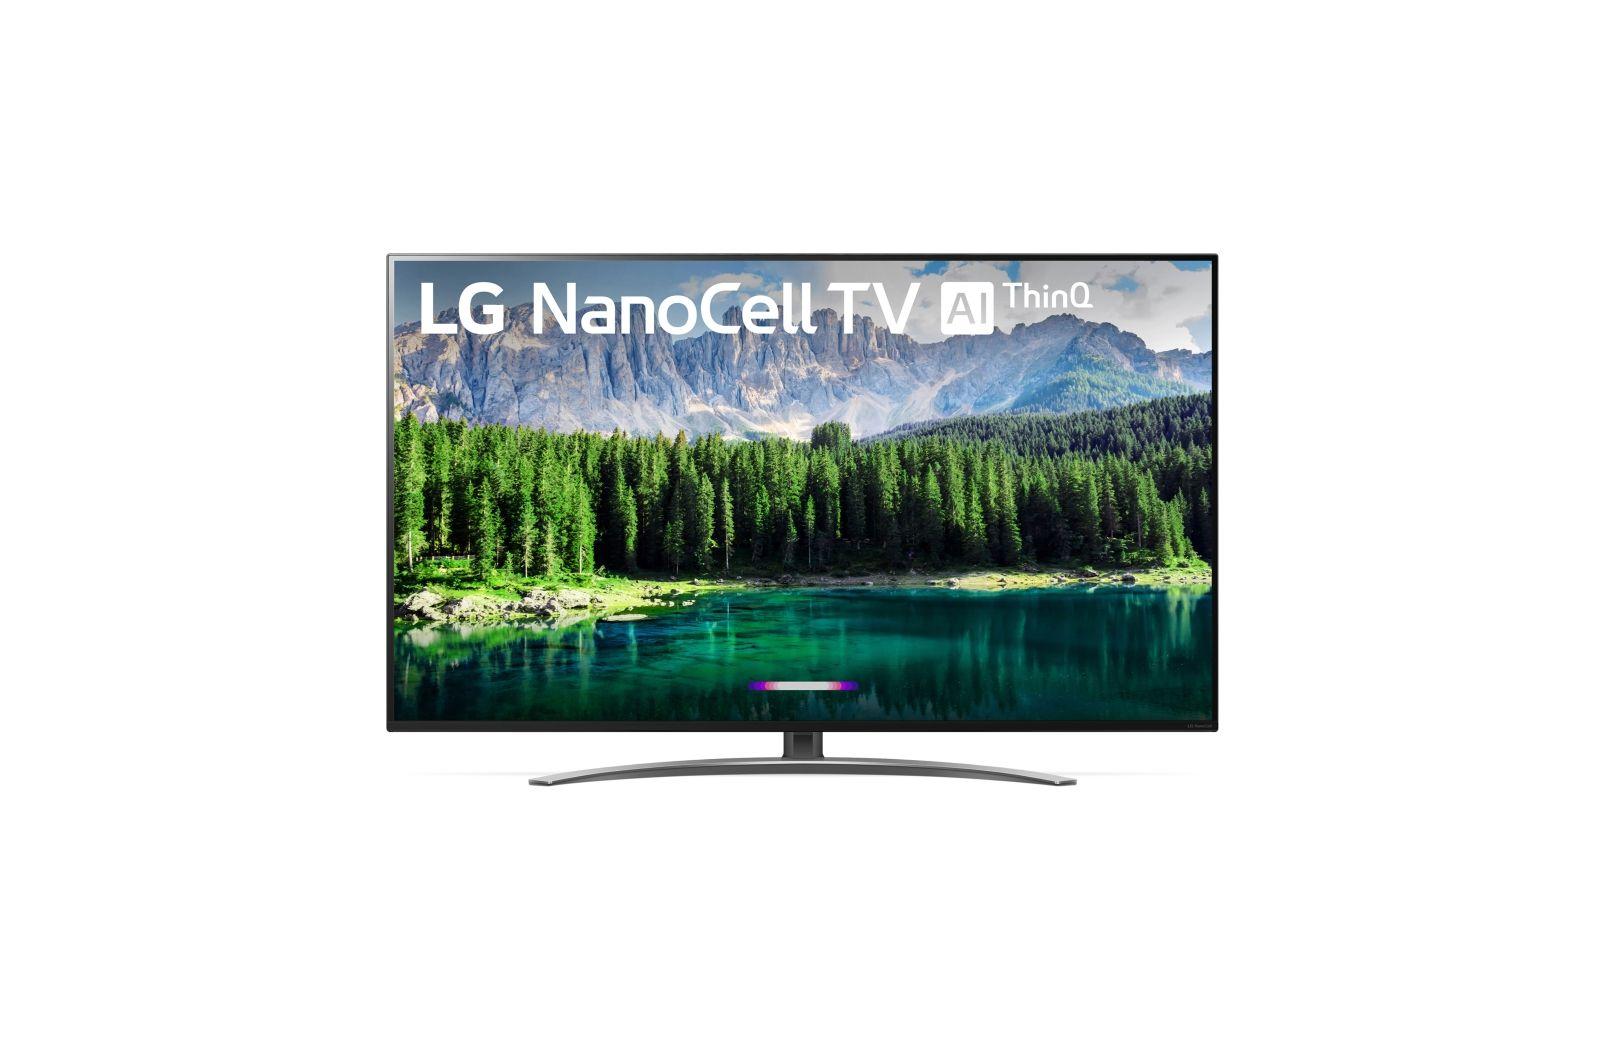 LG 55 Inch Nano 8 Series 4K UHD LED Smart TV55SM8600PUA